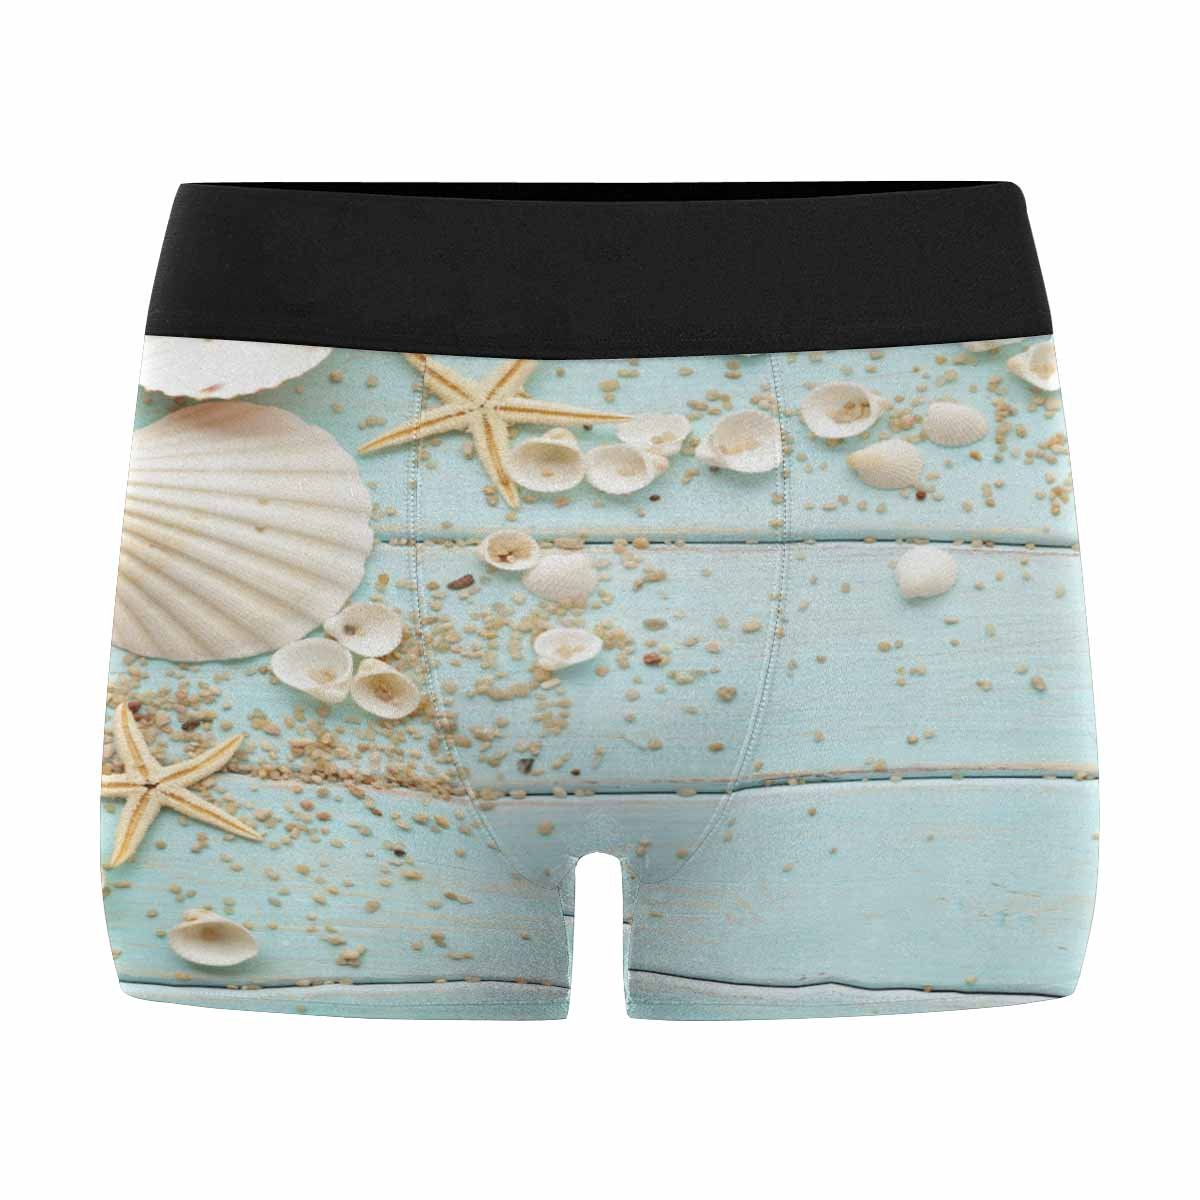 INTERESTPRINT Boxer Briefs Mens Underwear Seashells Frame on Wooden Nautical Border XS-3XL